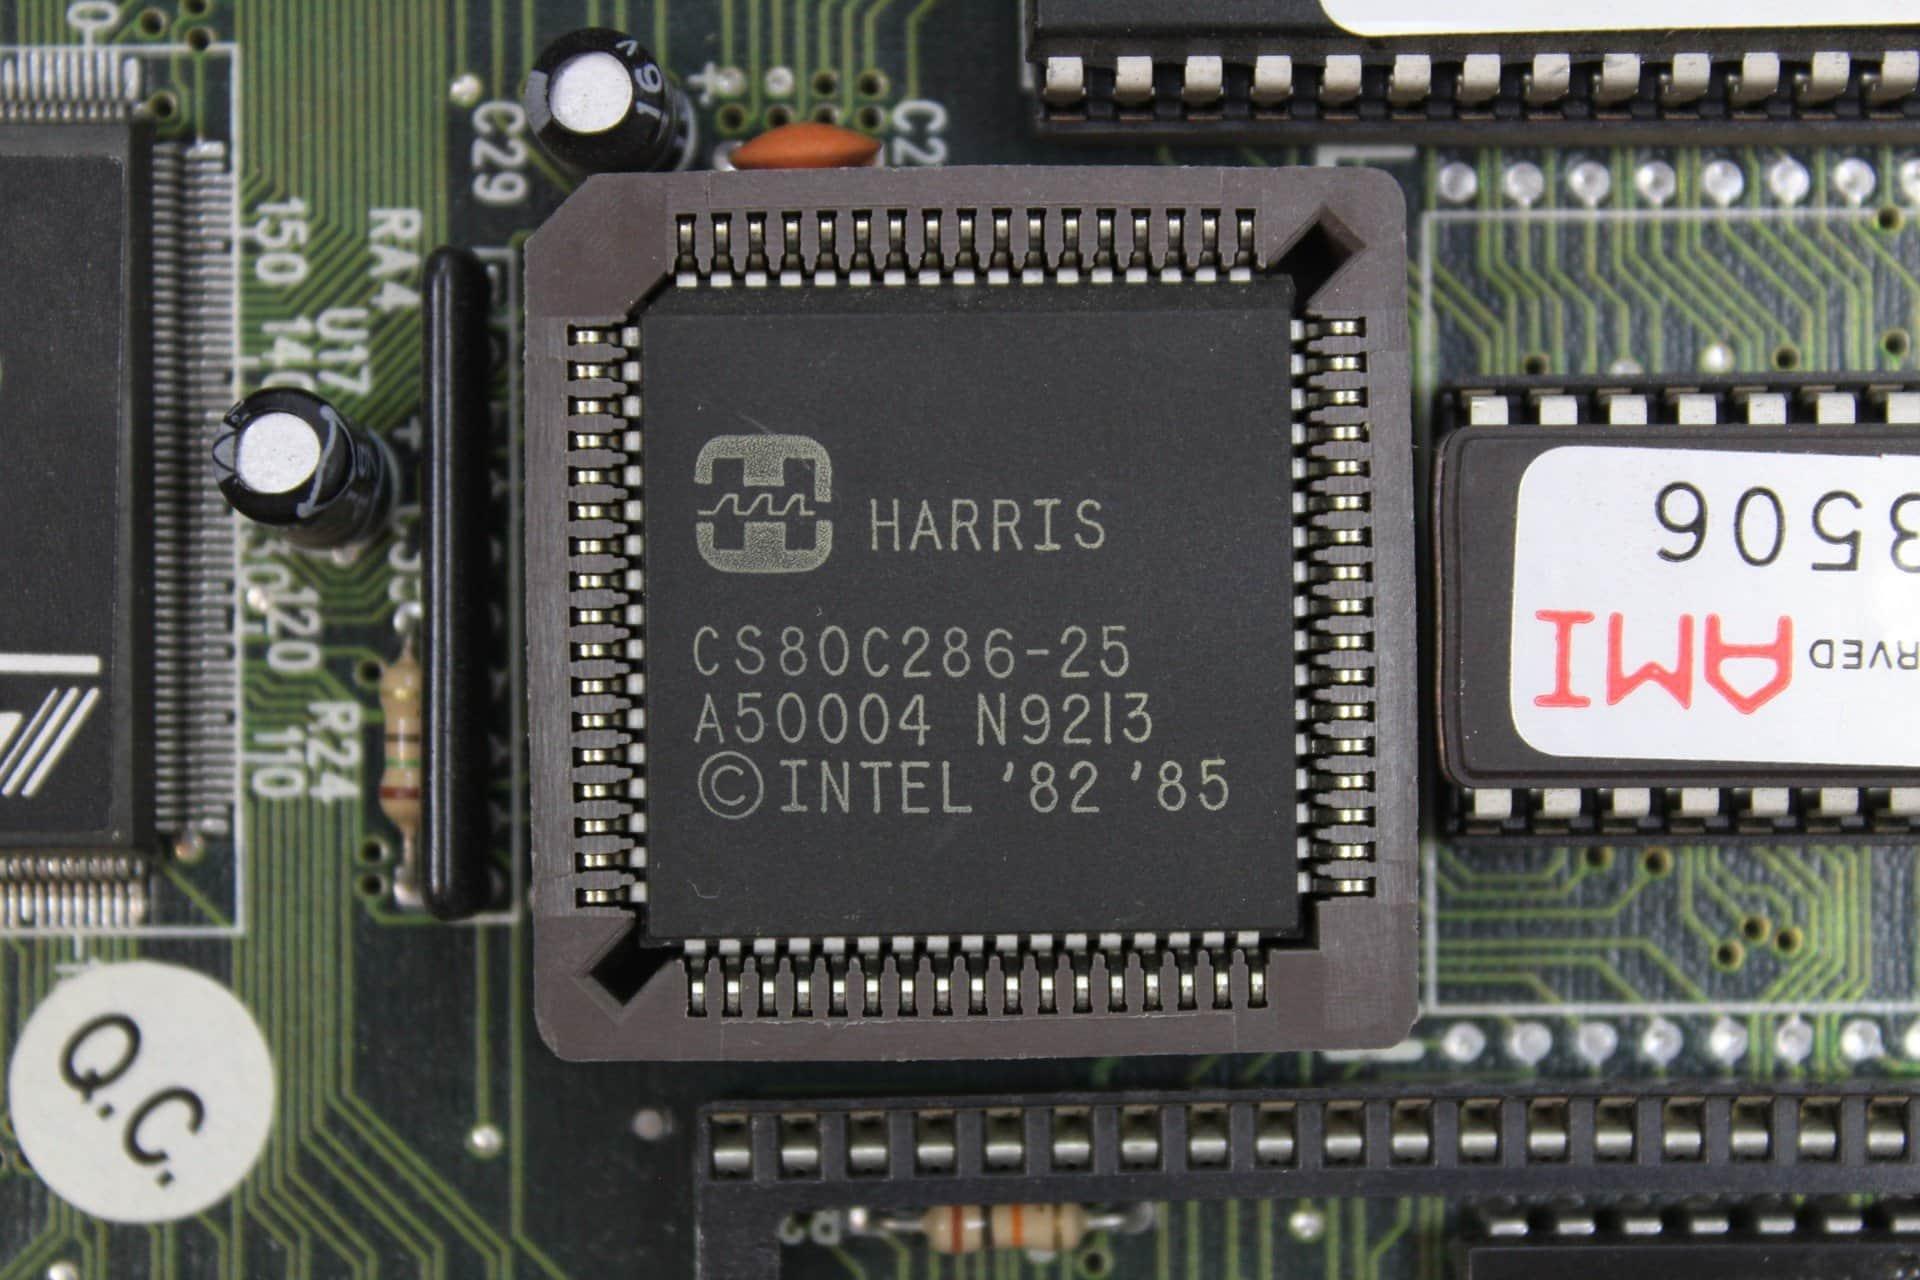 8c2720b48 ... Procesor Harris 286 na 25MHz - PC VUJO 286 na 25MHz ...